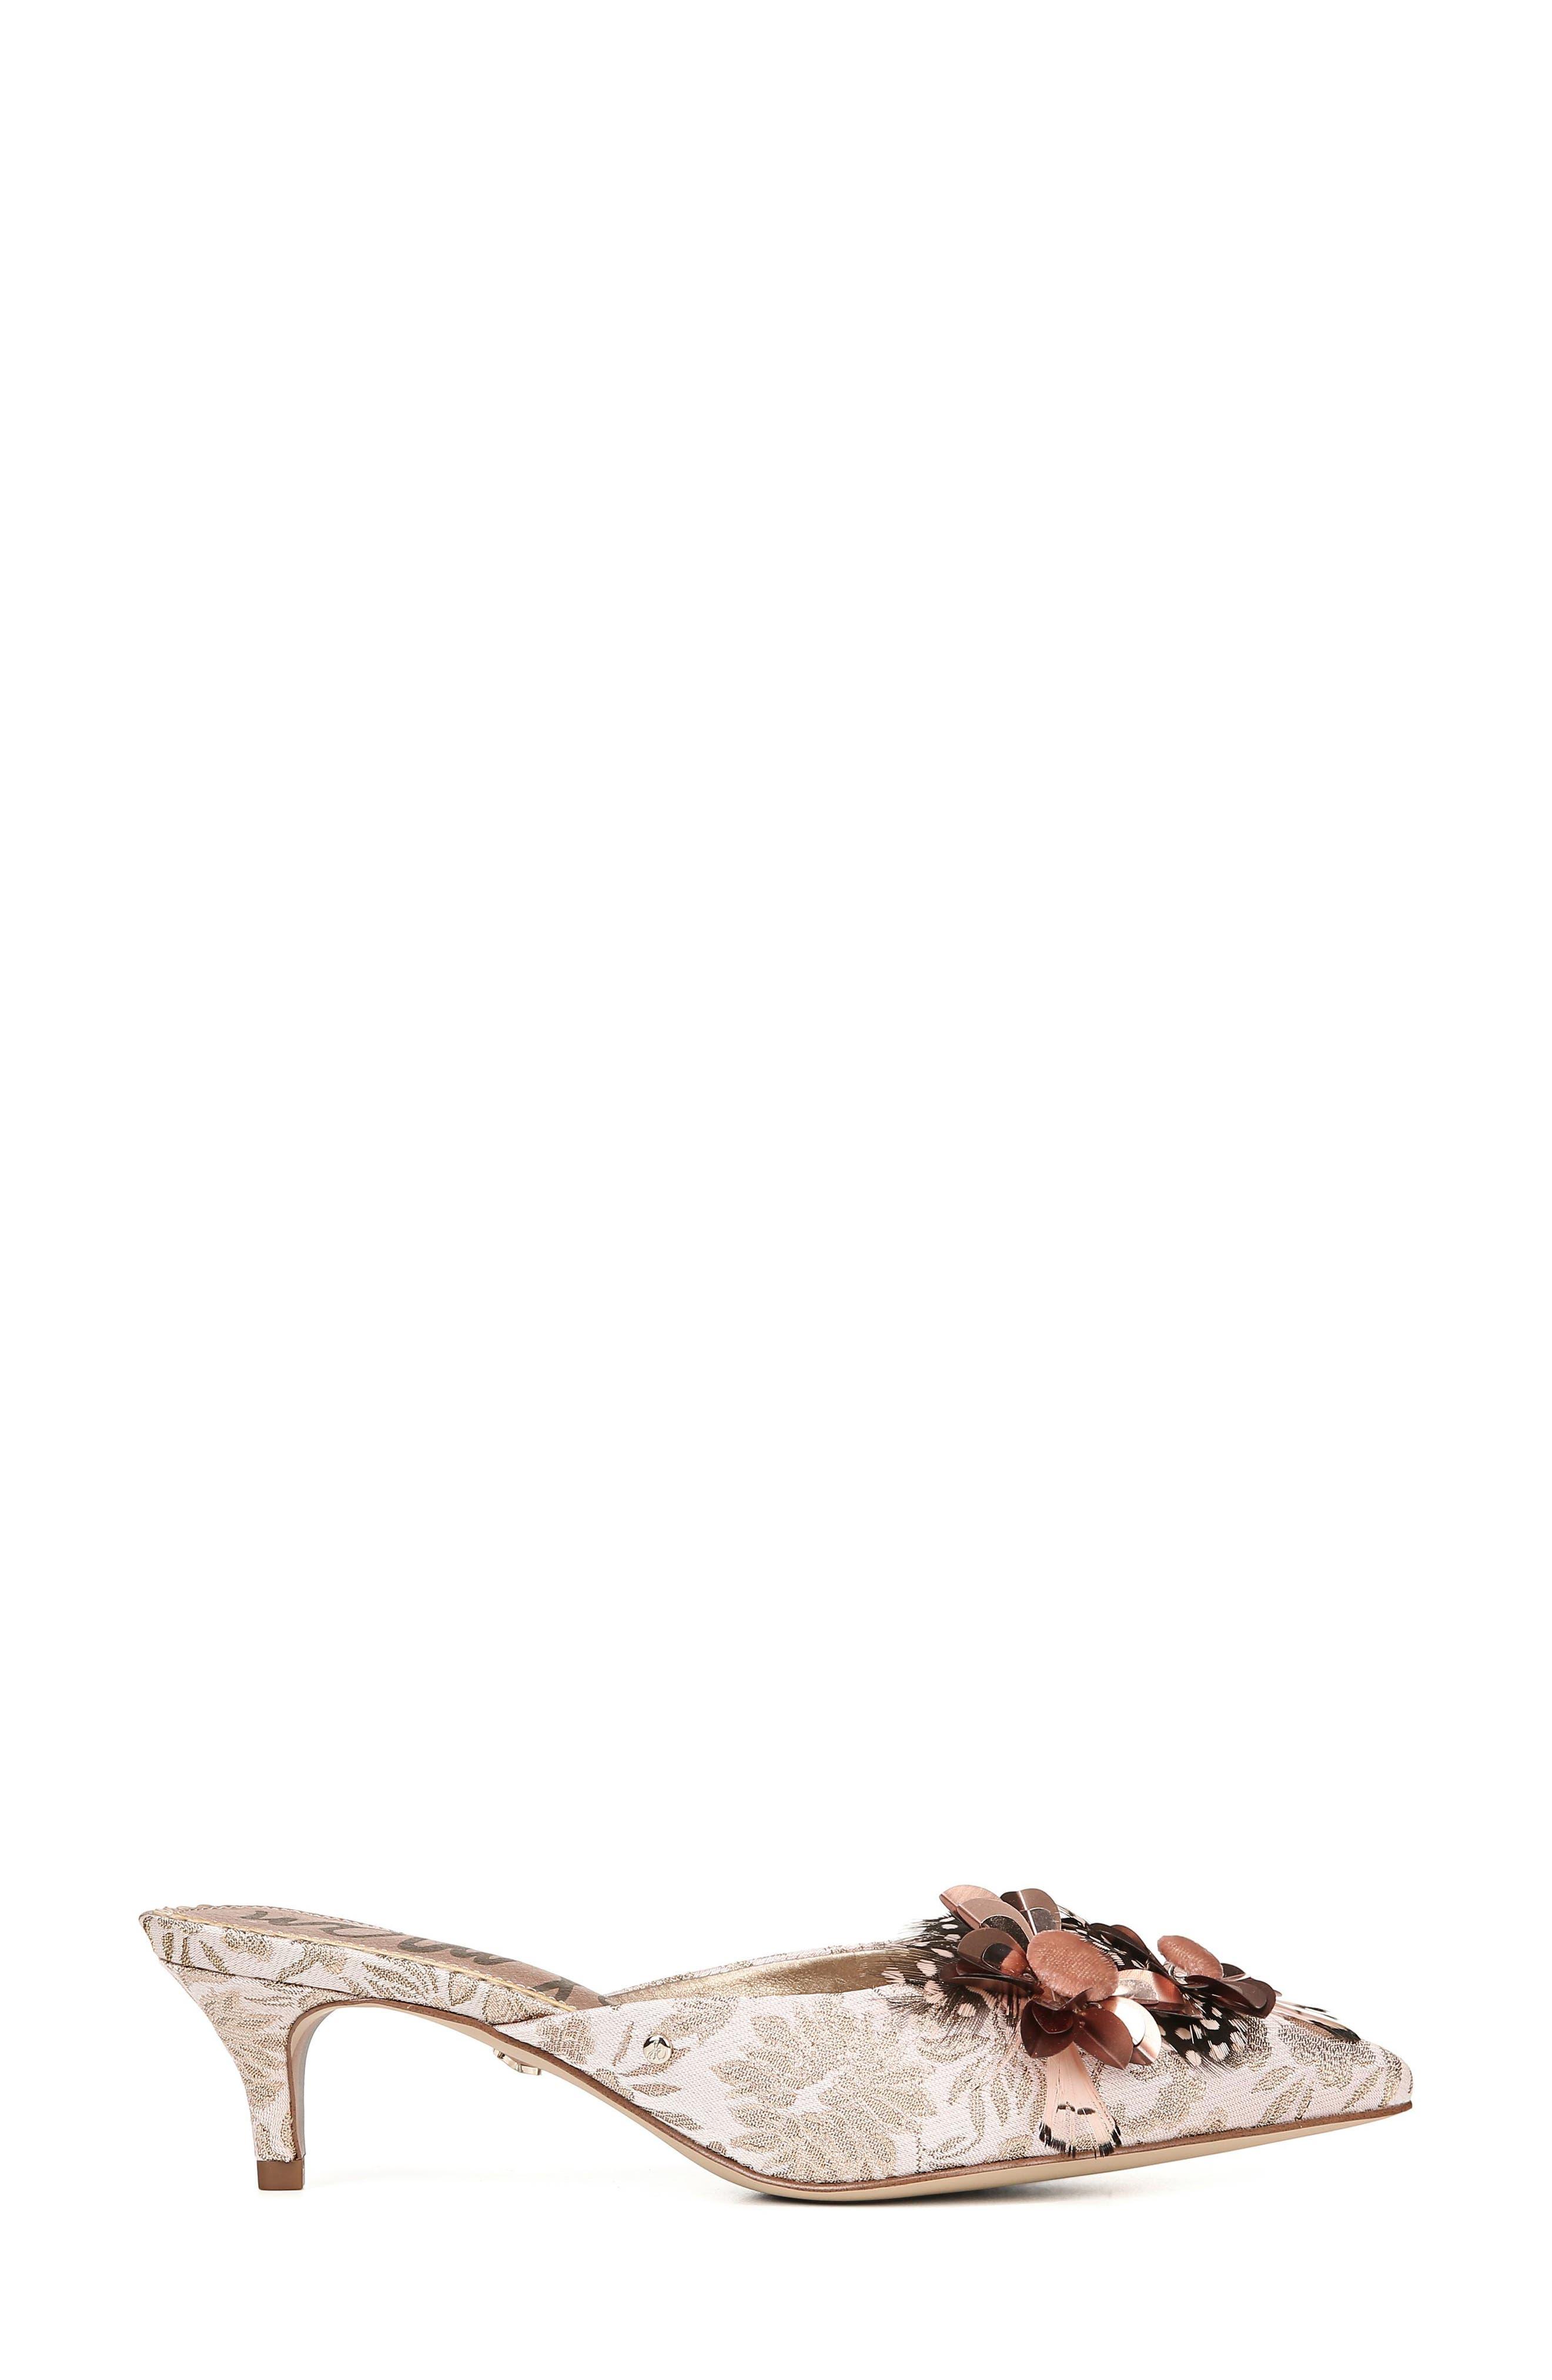 Dorcy Embellished Mule,                             Alternate thumbnail 3, color,                             CAMEO PINK JACQUARD